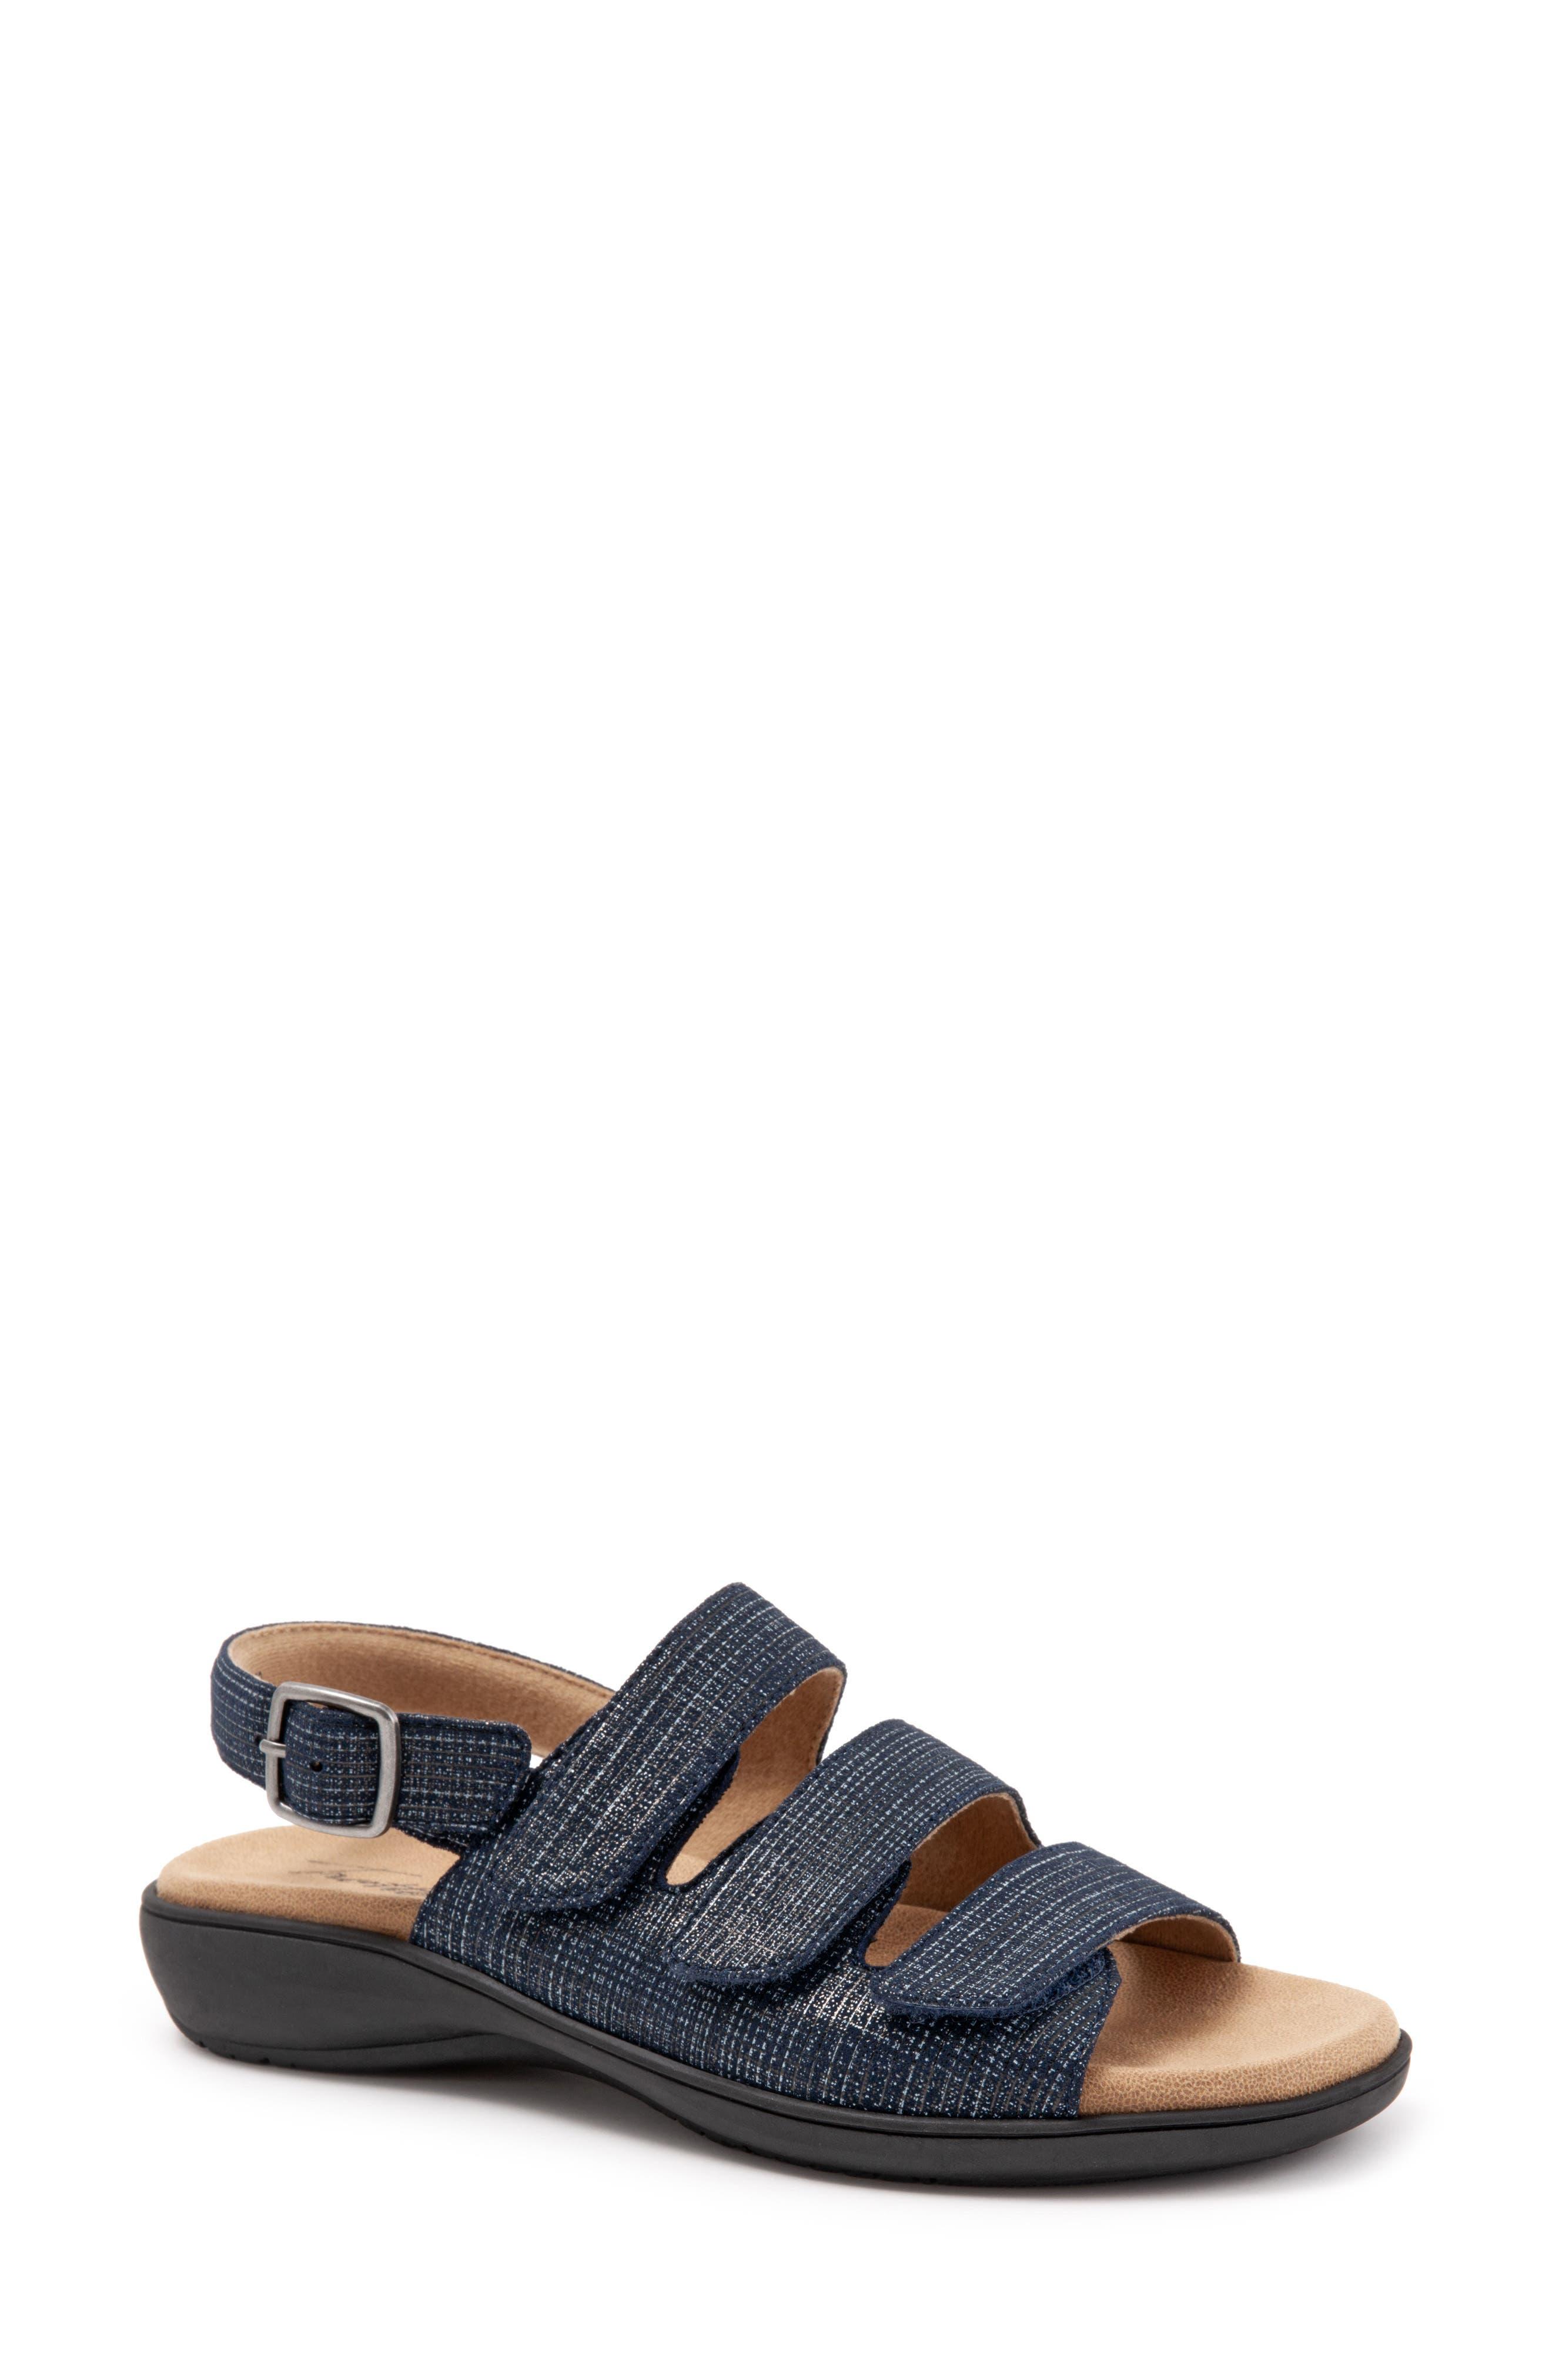 Trotters Vine Sandal W - Blue